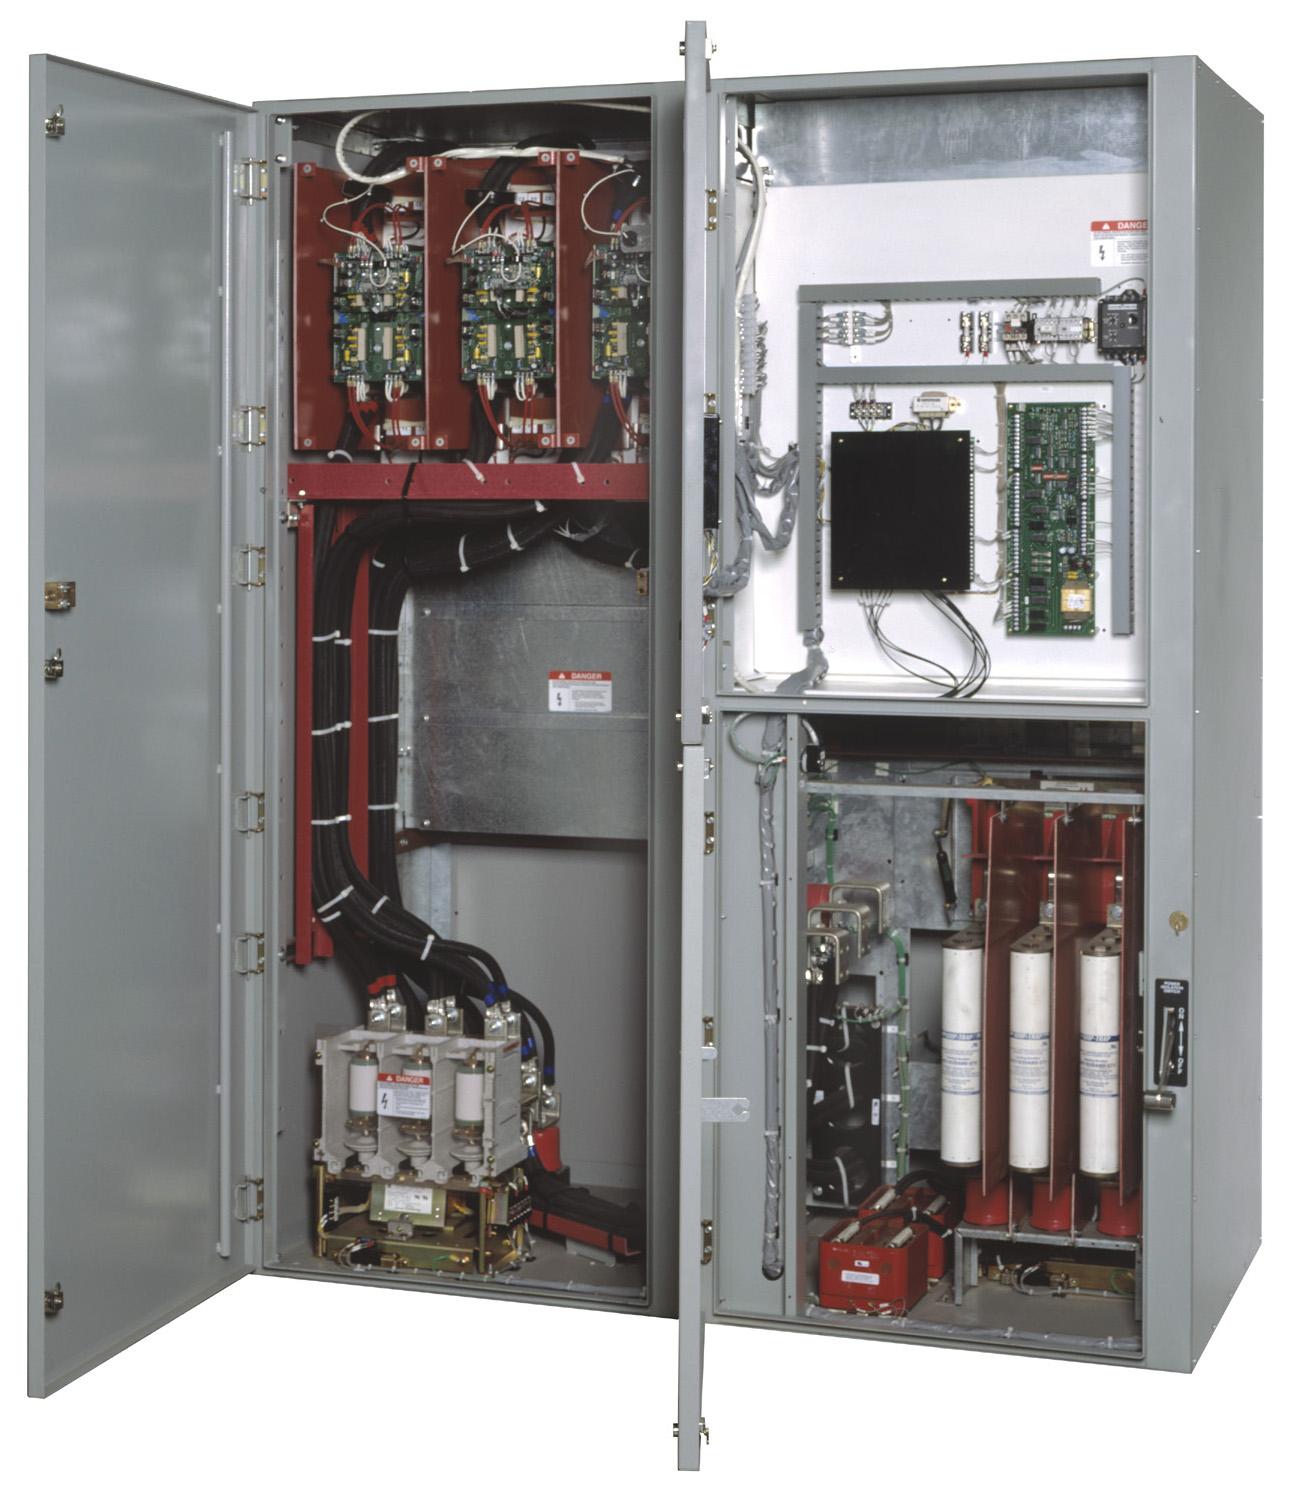 Medium Voltage Jk Motors Drives Toshiba International Corporation Jeep Wrangler Wiring Schematic At Computer Product Image Gallery